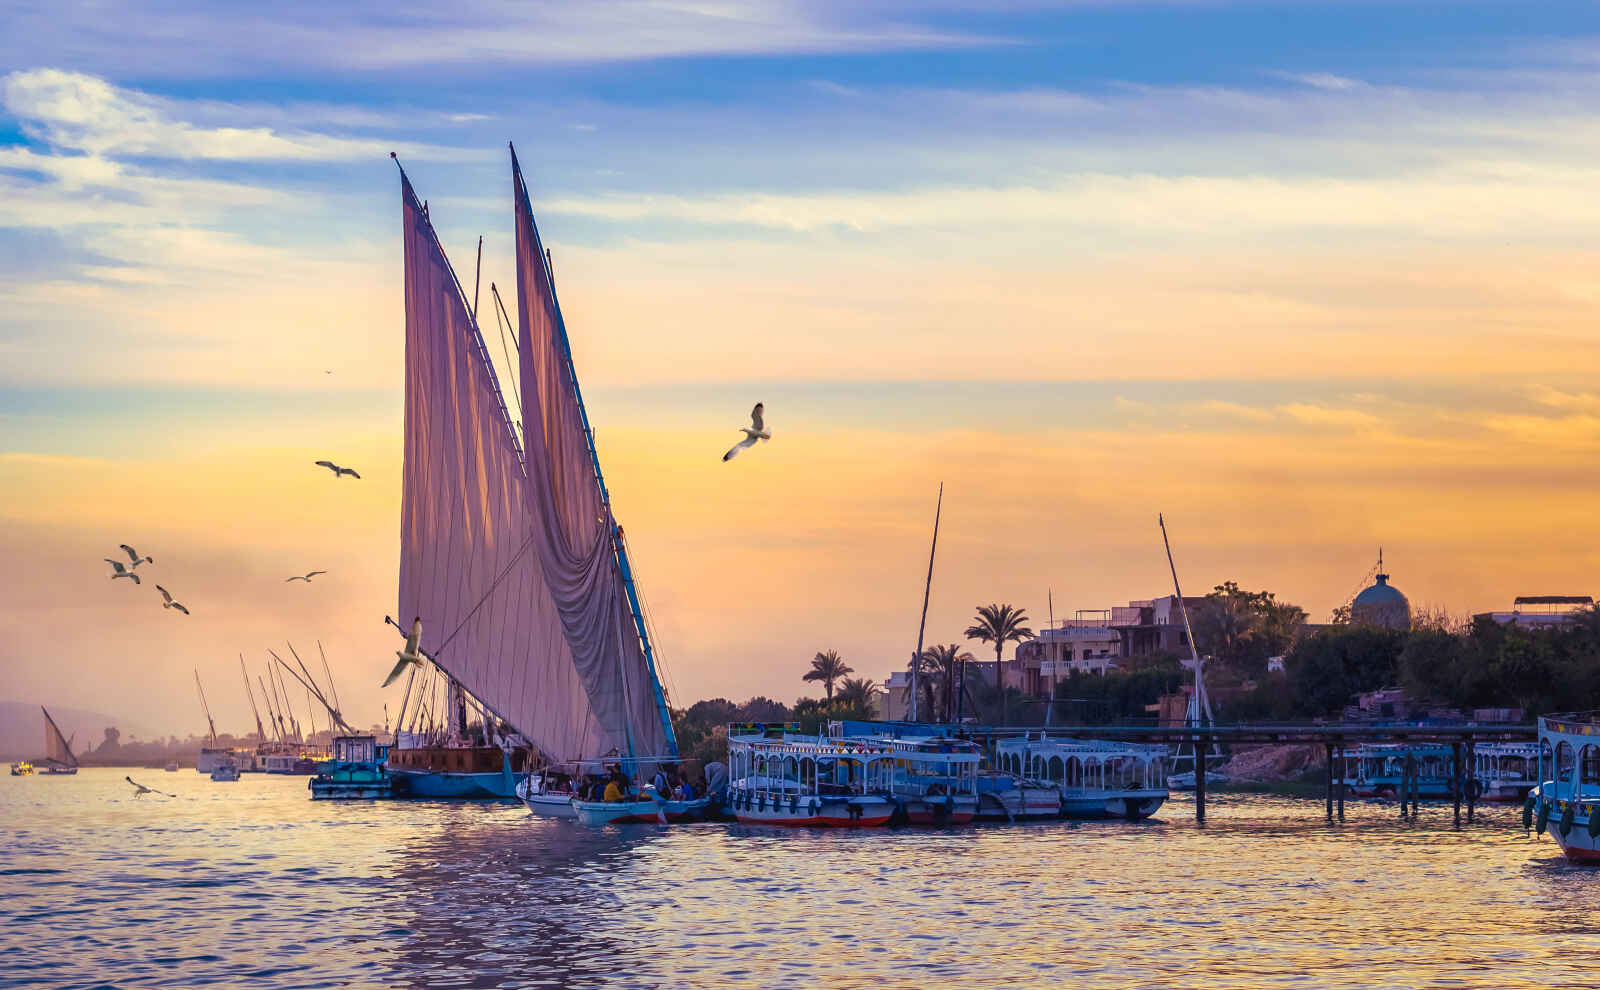 Égypte : Flânerie au fil du Nil